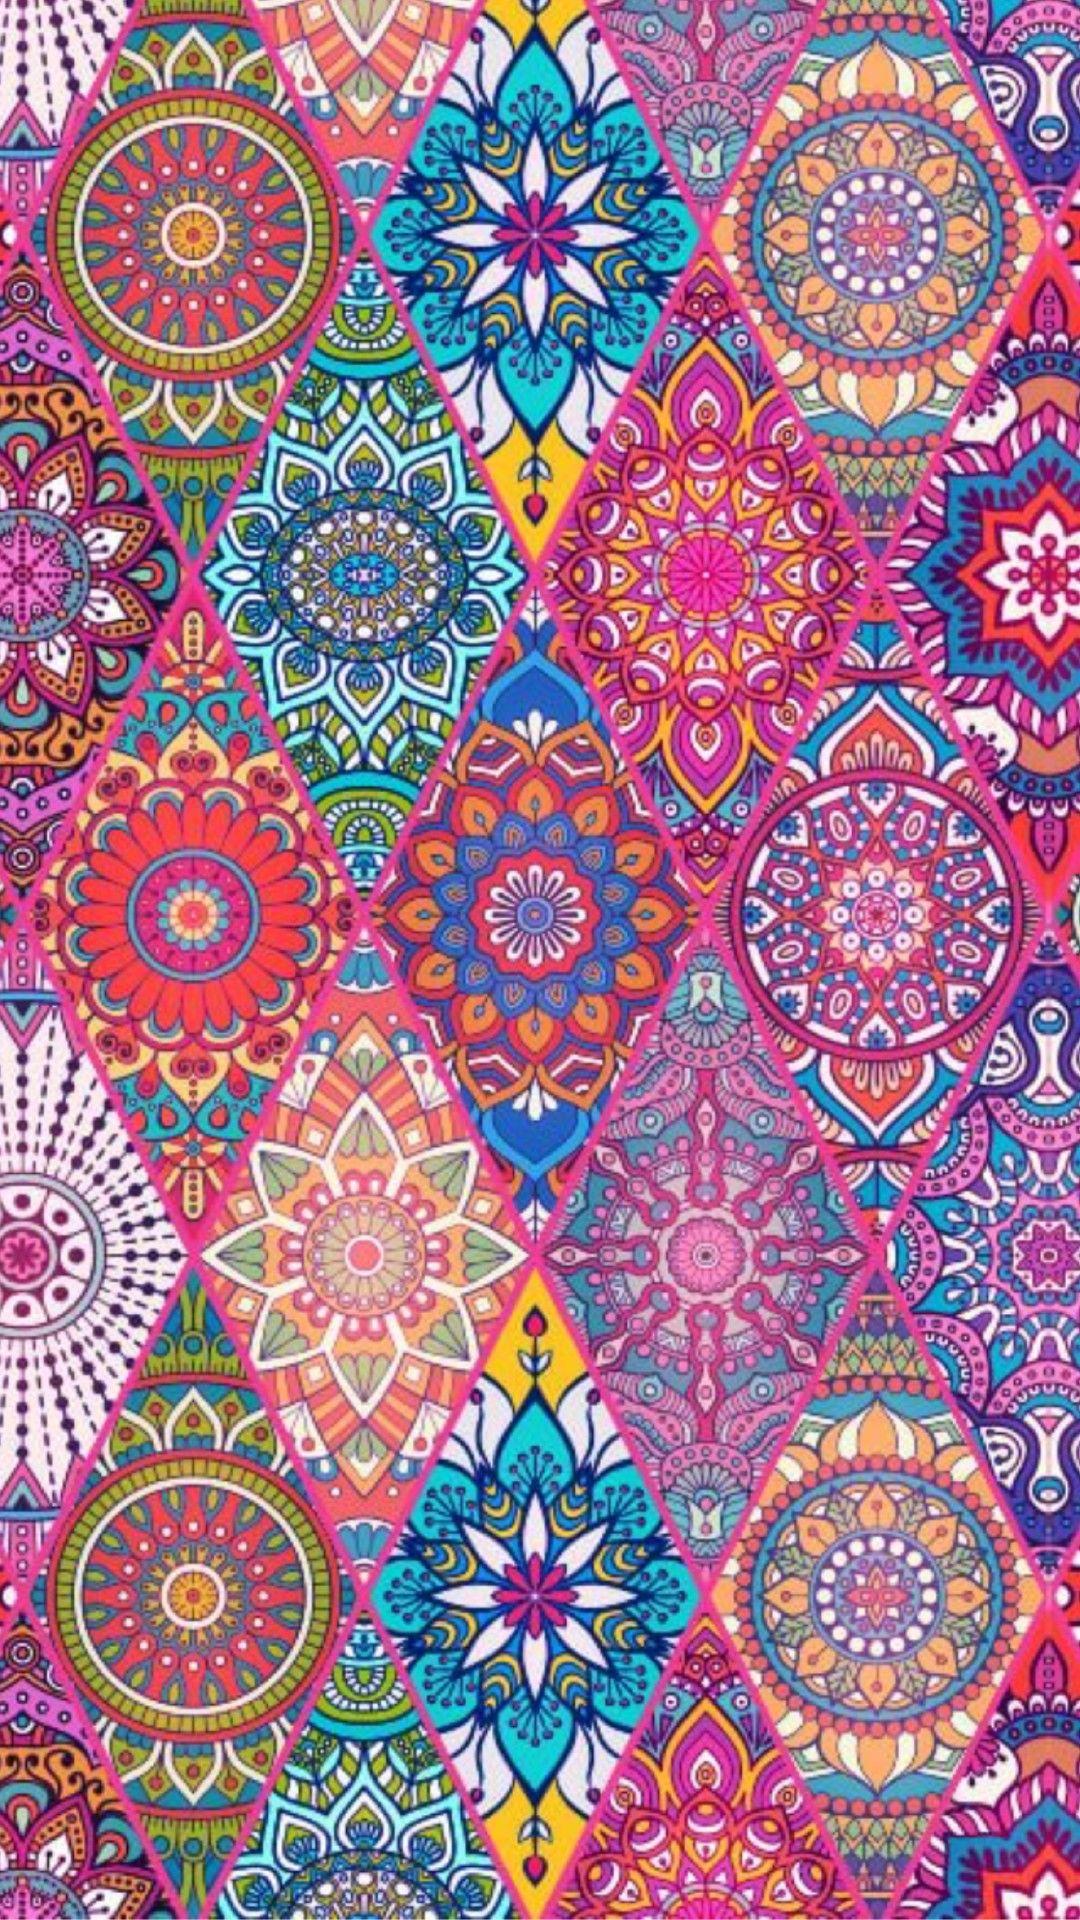 Colorful Pattern Wallpapaer Wallpaper Mobile Iphone Wallpaper Pattern Mandala Wallpaper Pattern Wallpaper